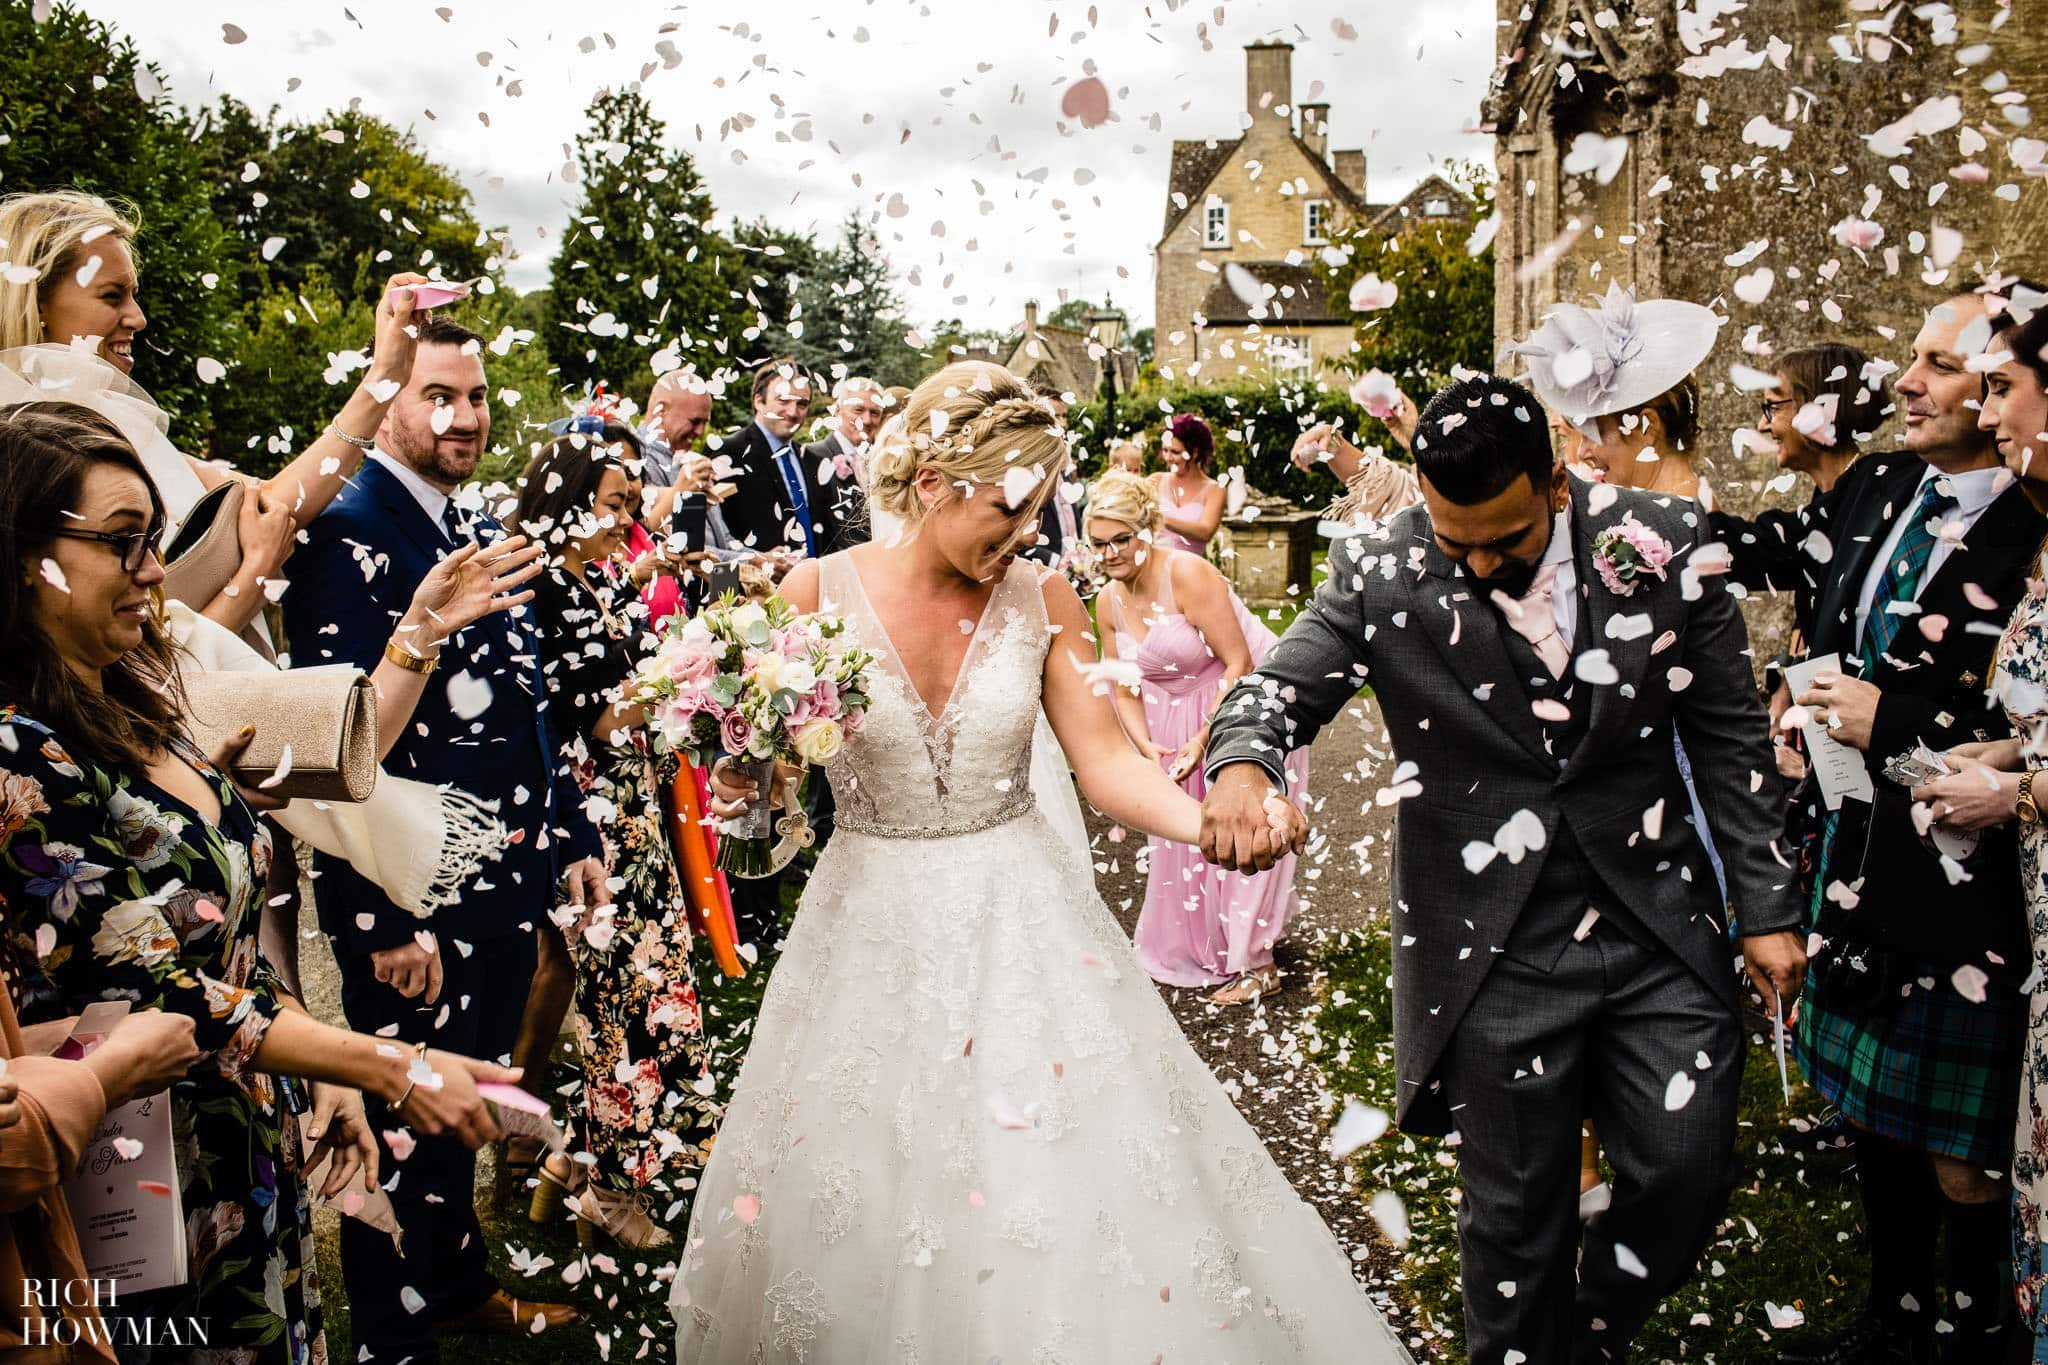 Wedding Photographers in Oxfordshire | Wedding Photographers Witney 369